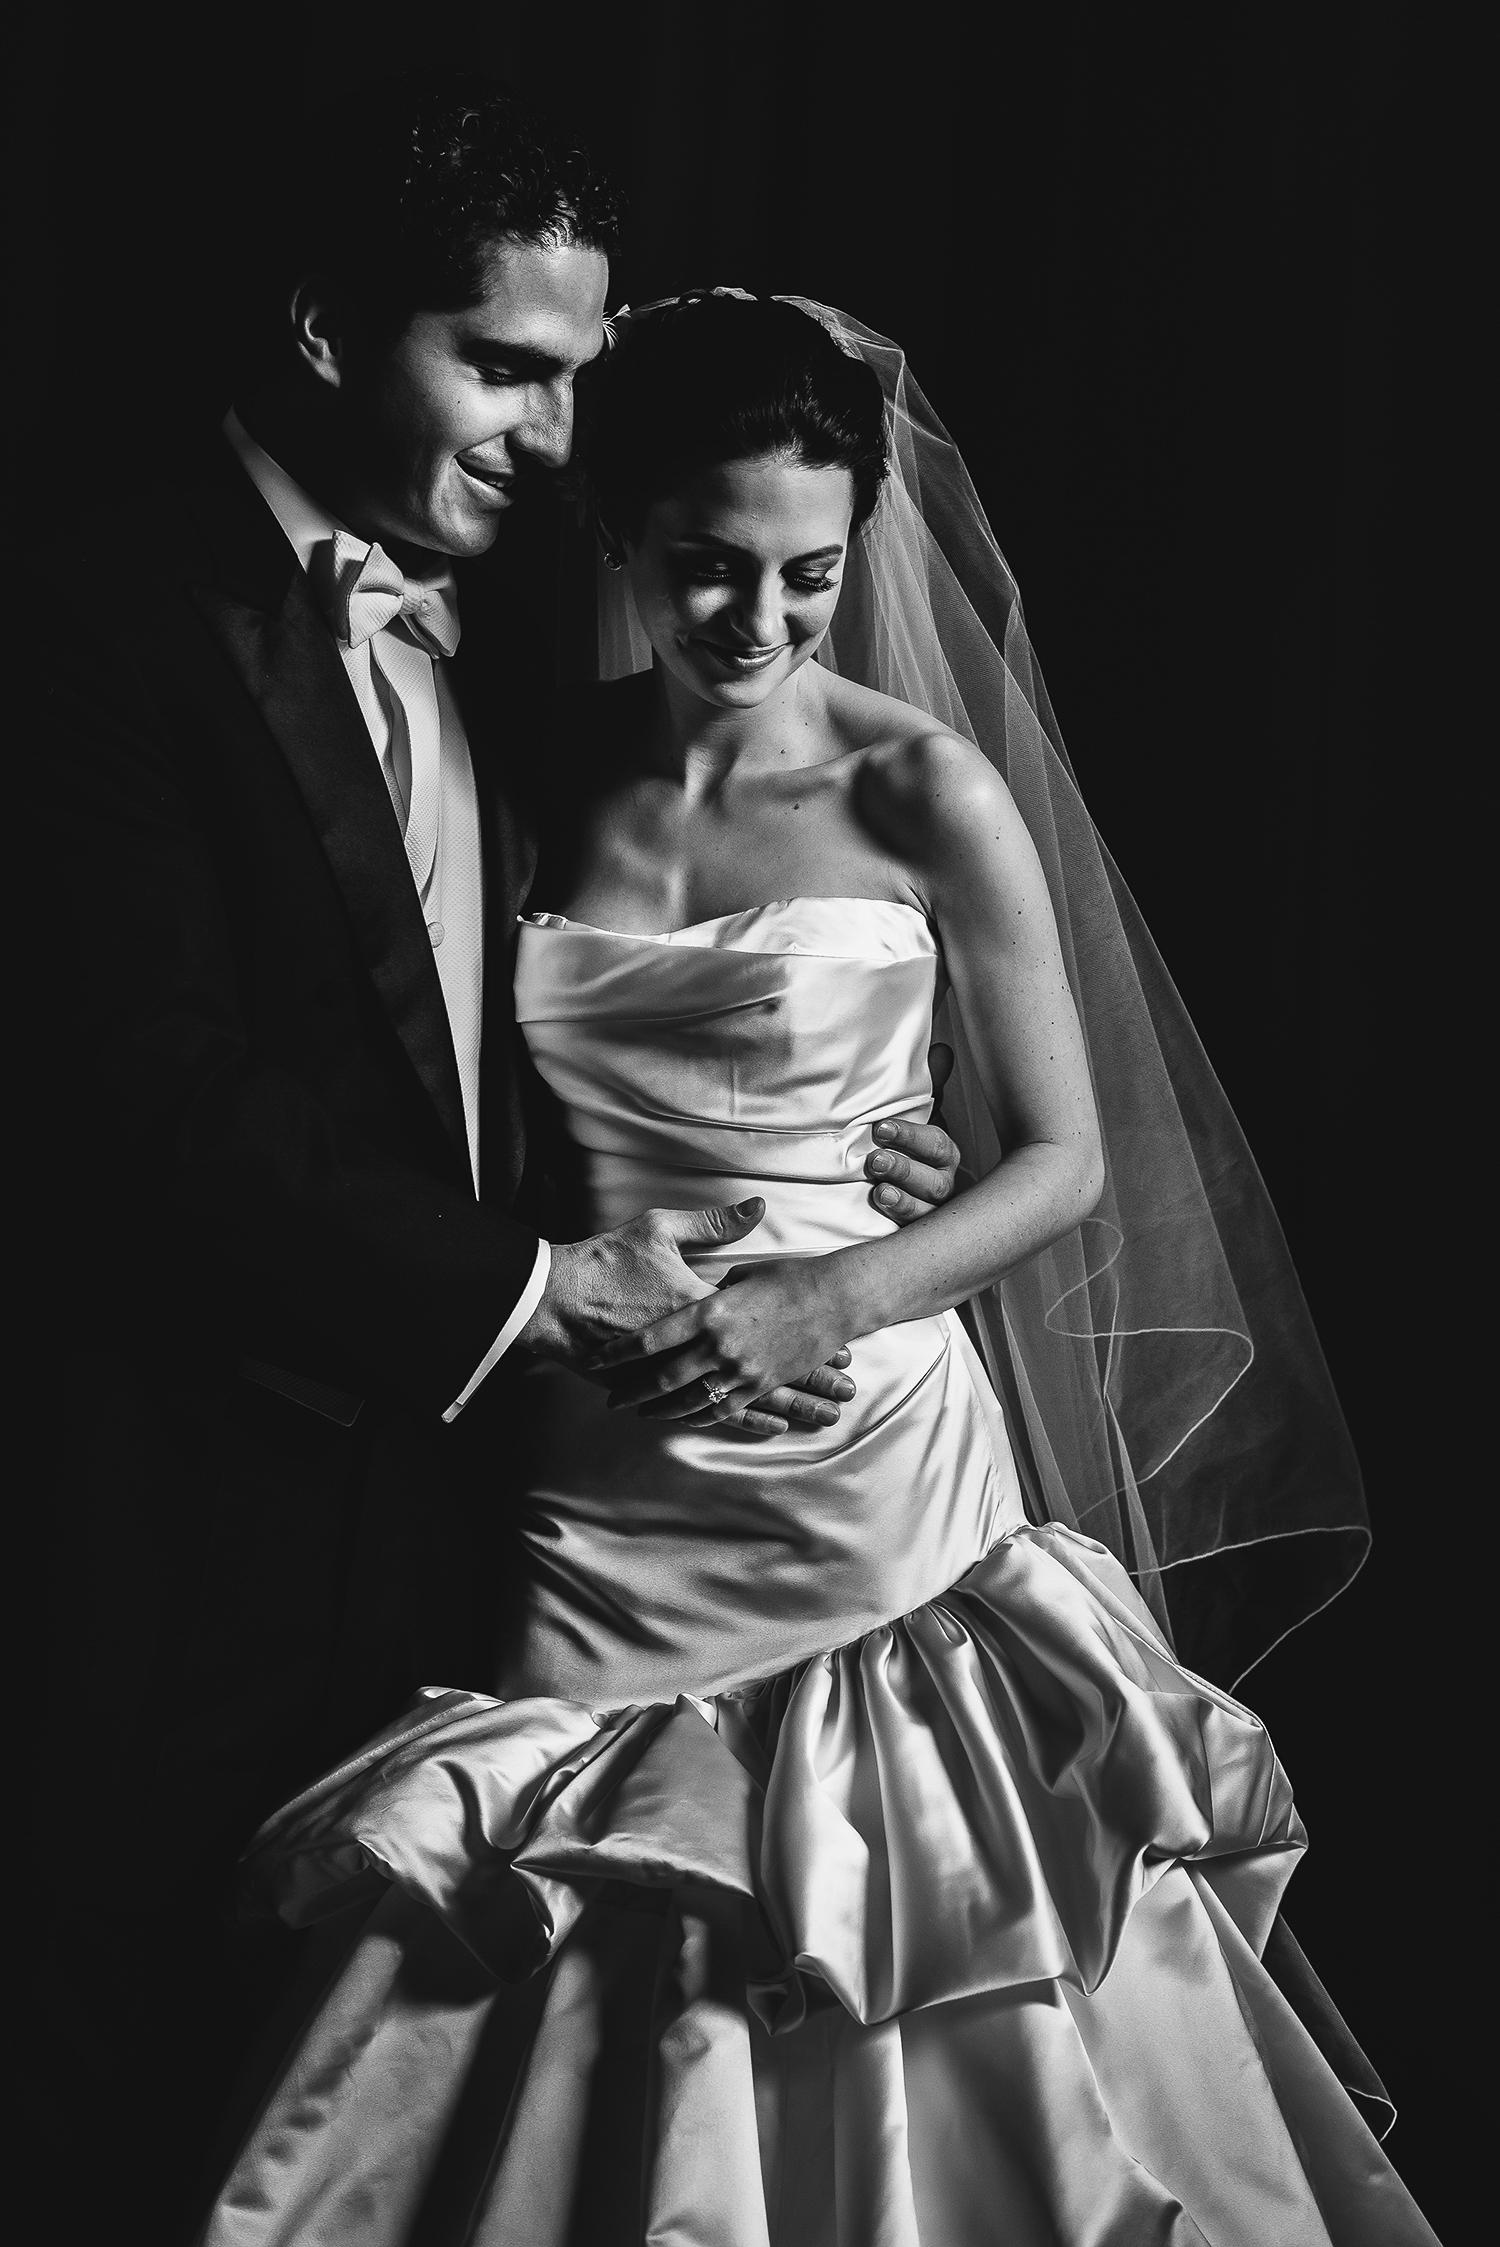 boda-colegio-vizcainas-mexico-wedding-photographer (4).jpg